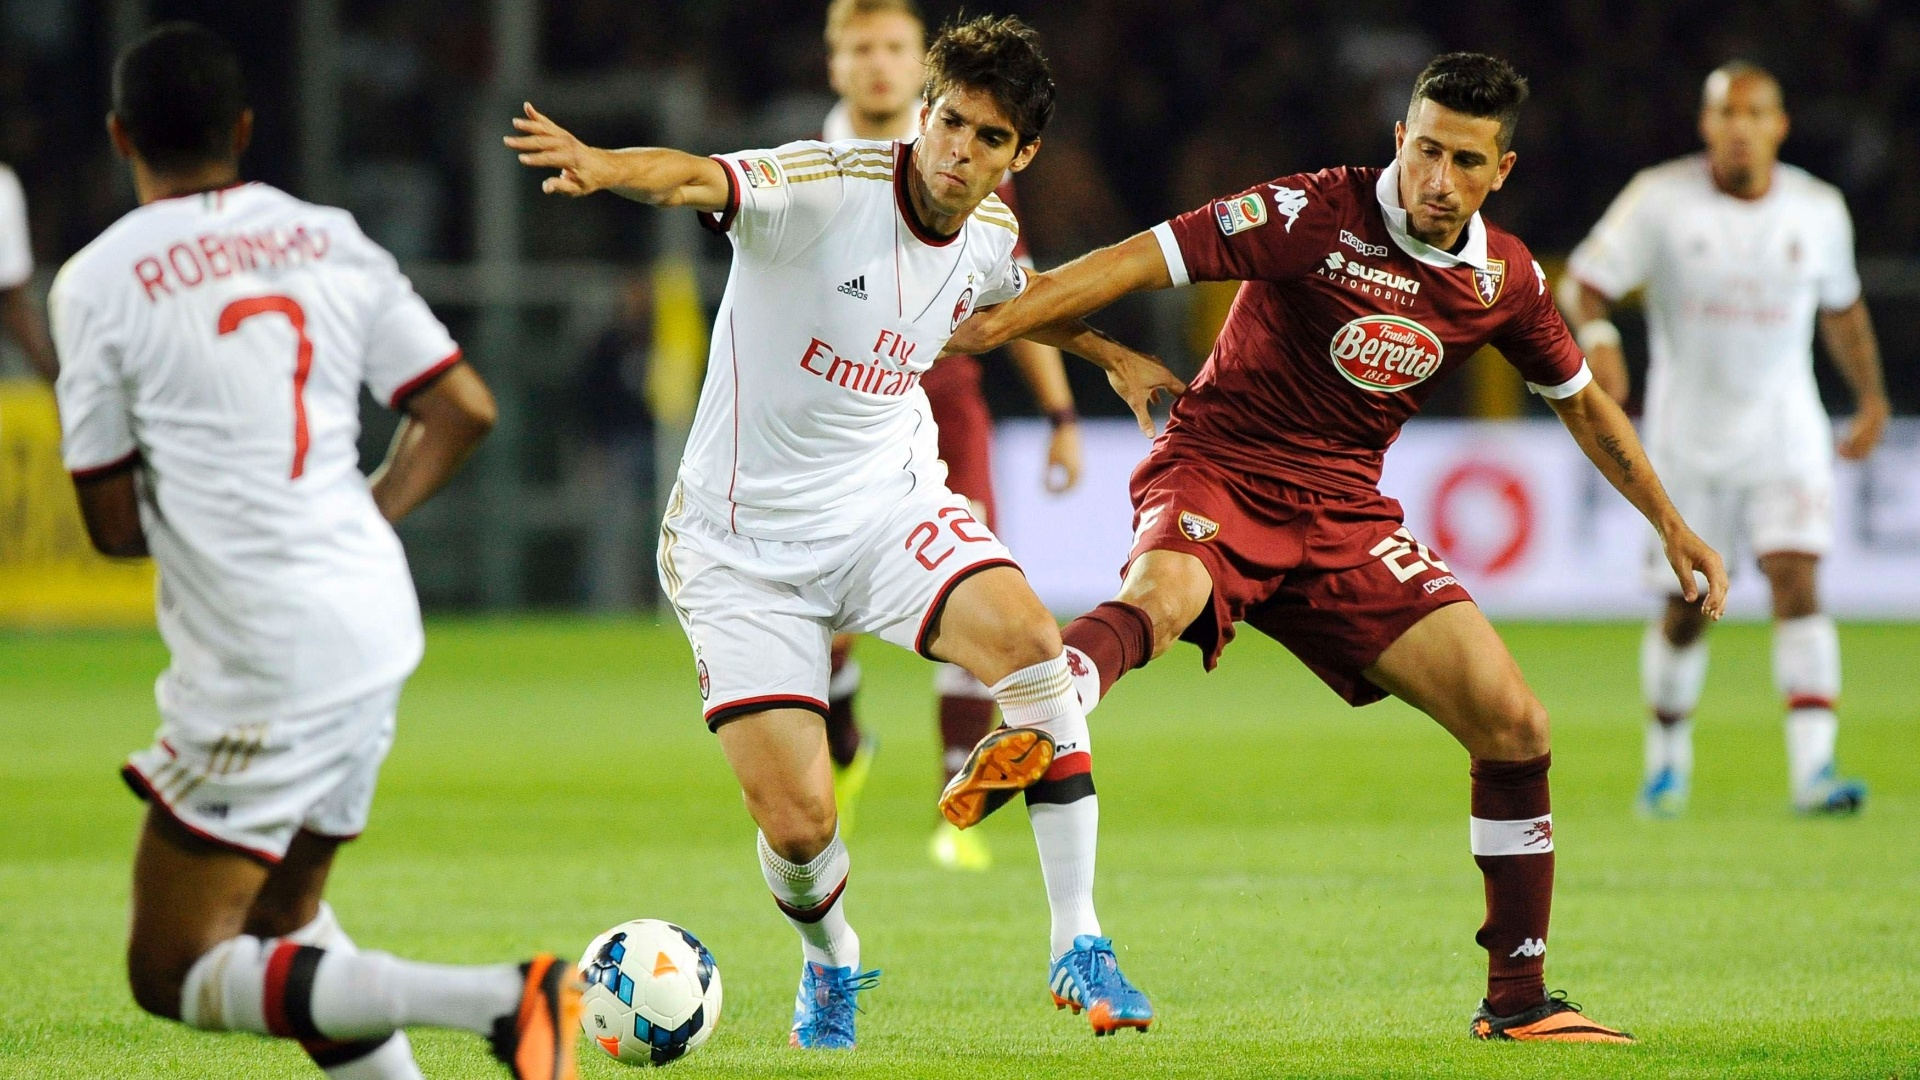 14.09.2013 - Kaká estreia como titular pelo Milan na partida contra o Torino, pelo Campeonato Italiano